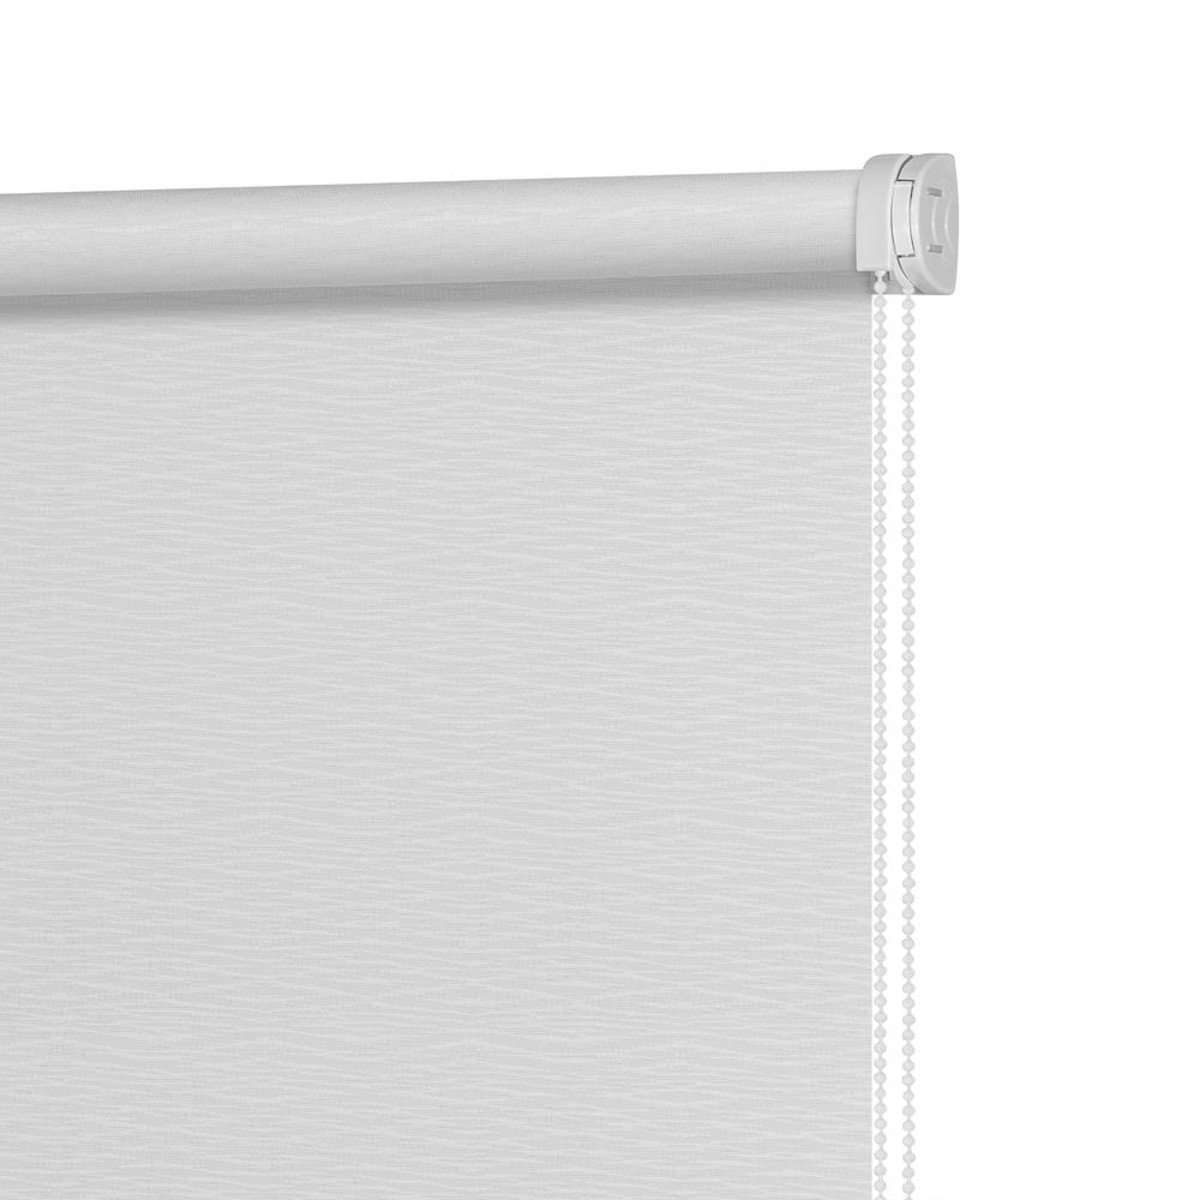 Рулонная Ора Decofest Маринела 40Х160 Цвет Серый